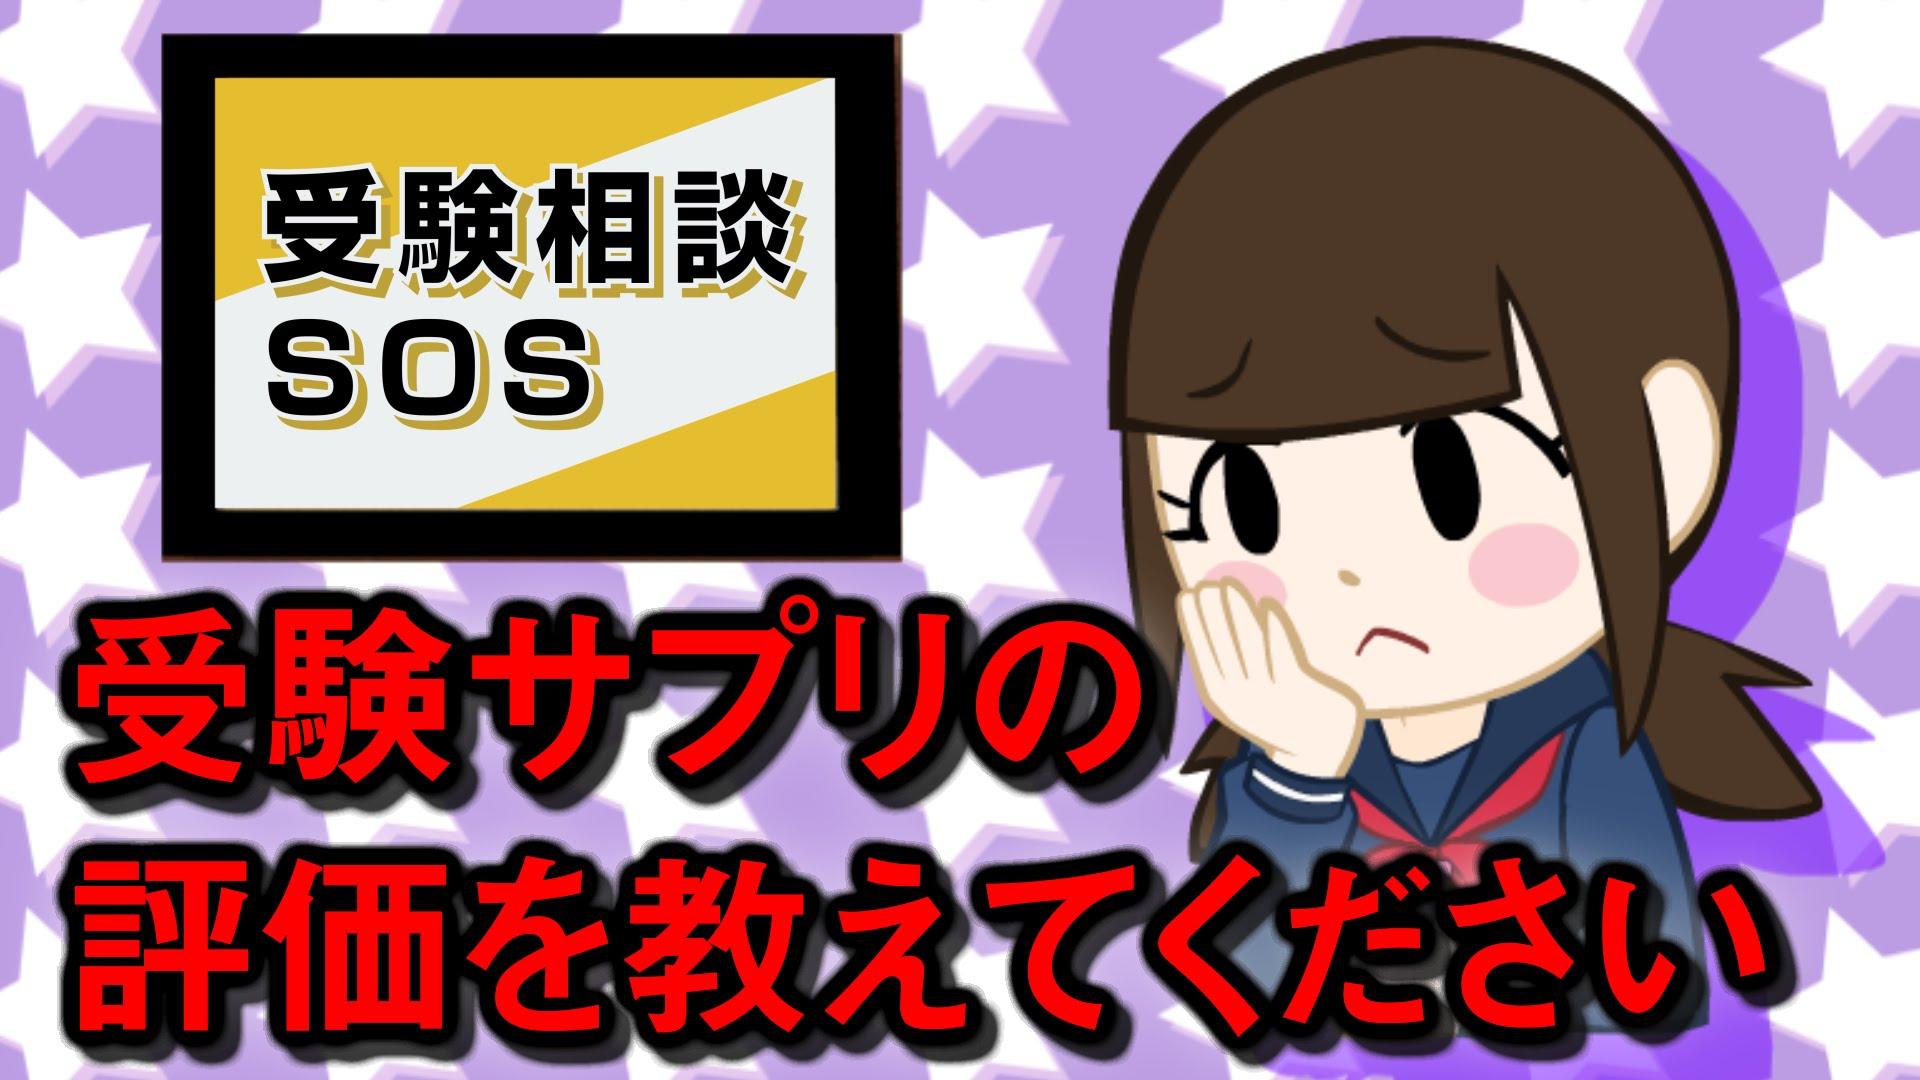 【vol.29】受験サプリの評判!?|受験相談SOS